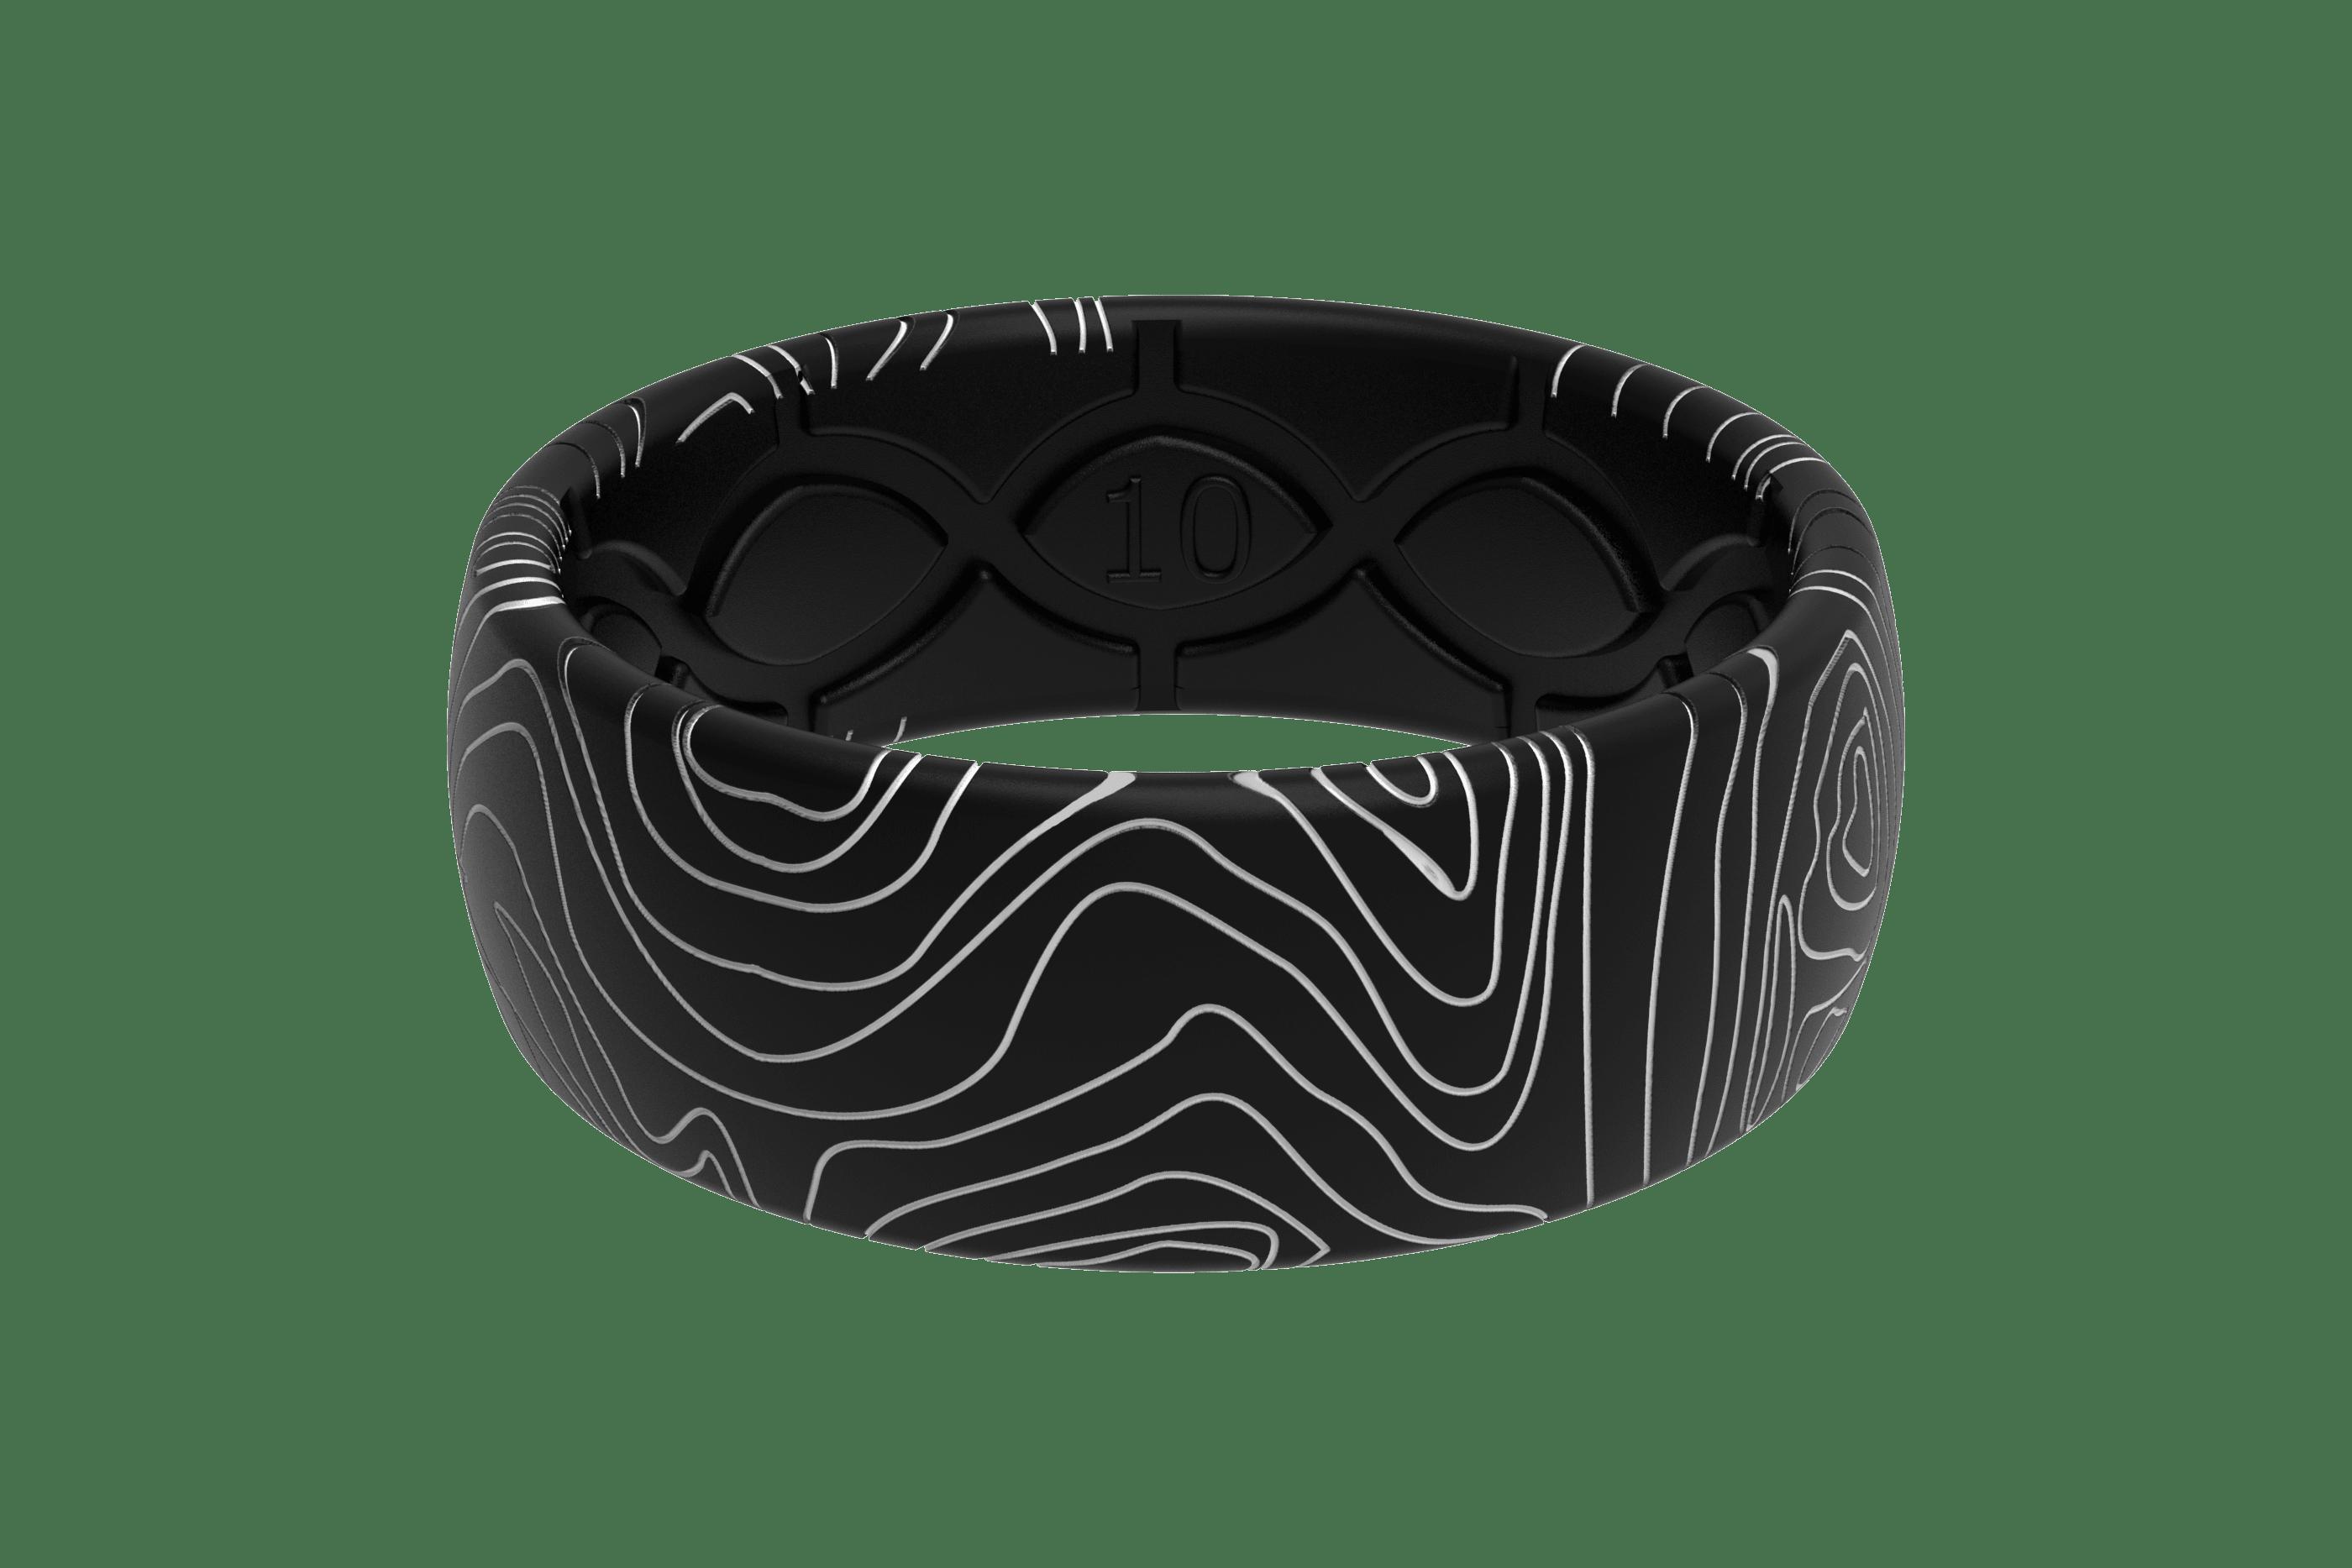 Original Dimension Topo Midnight Black/Grey  viewed front on